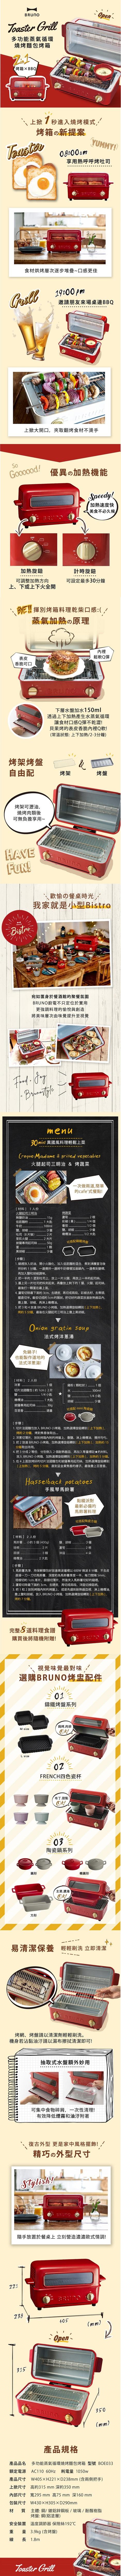 BRUNO|BOE033 多功能燒烤麵包機